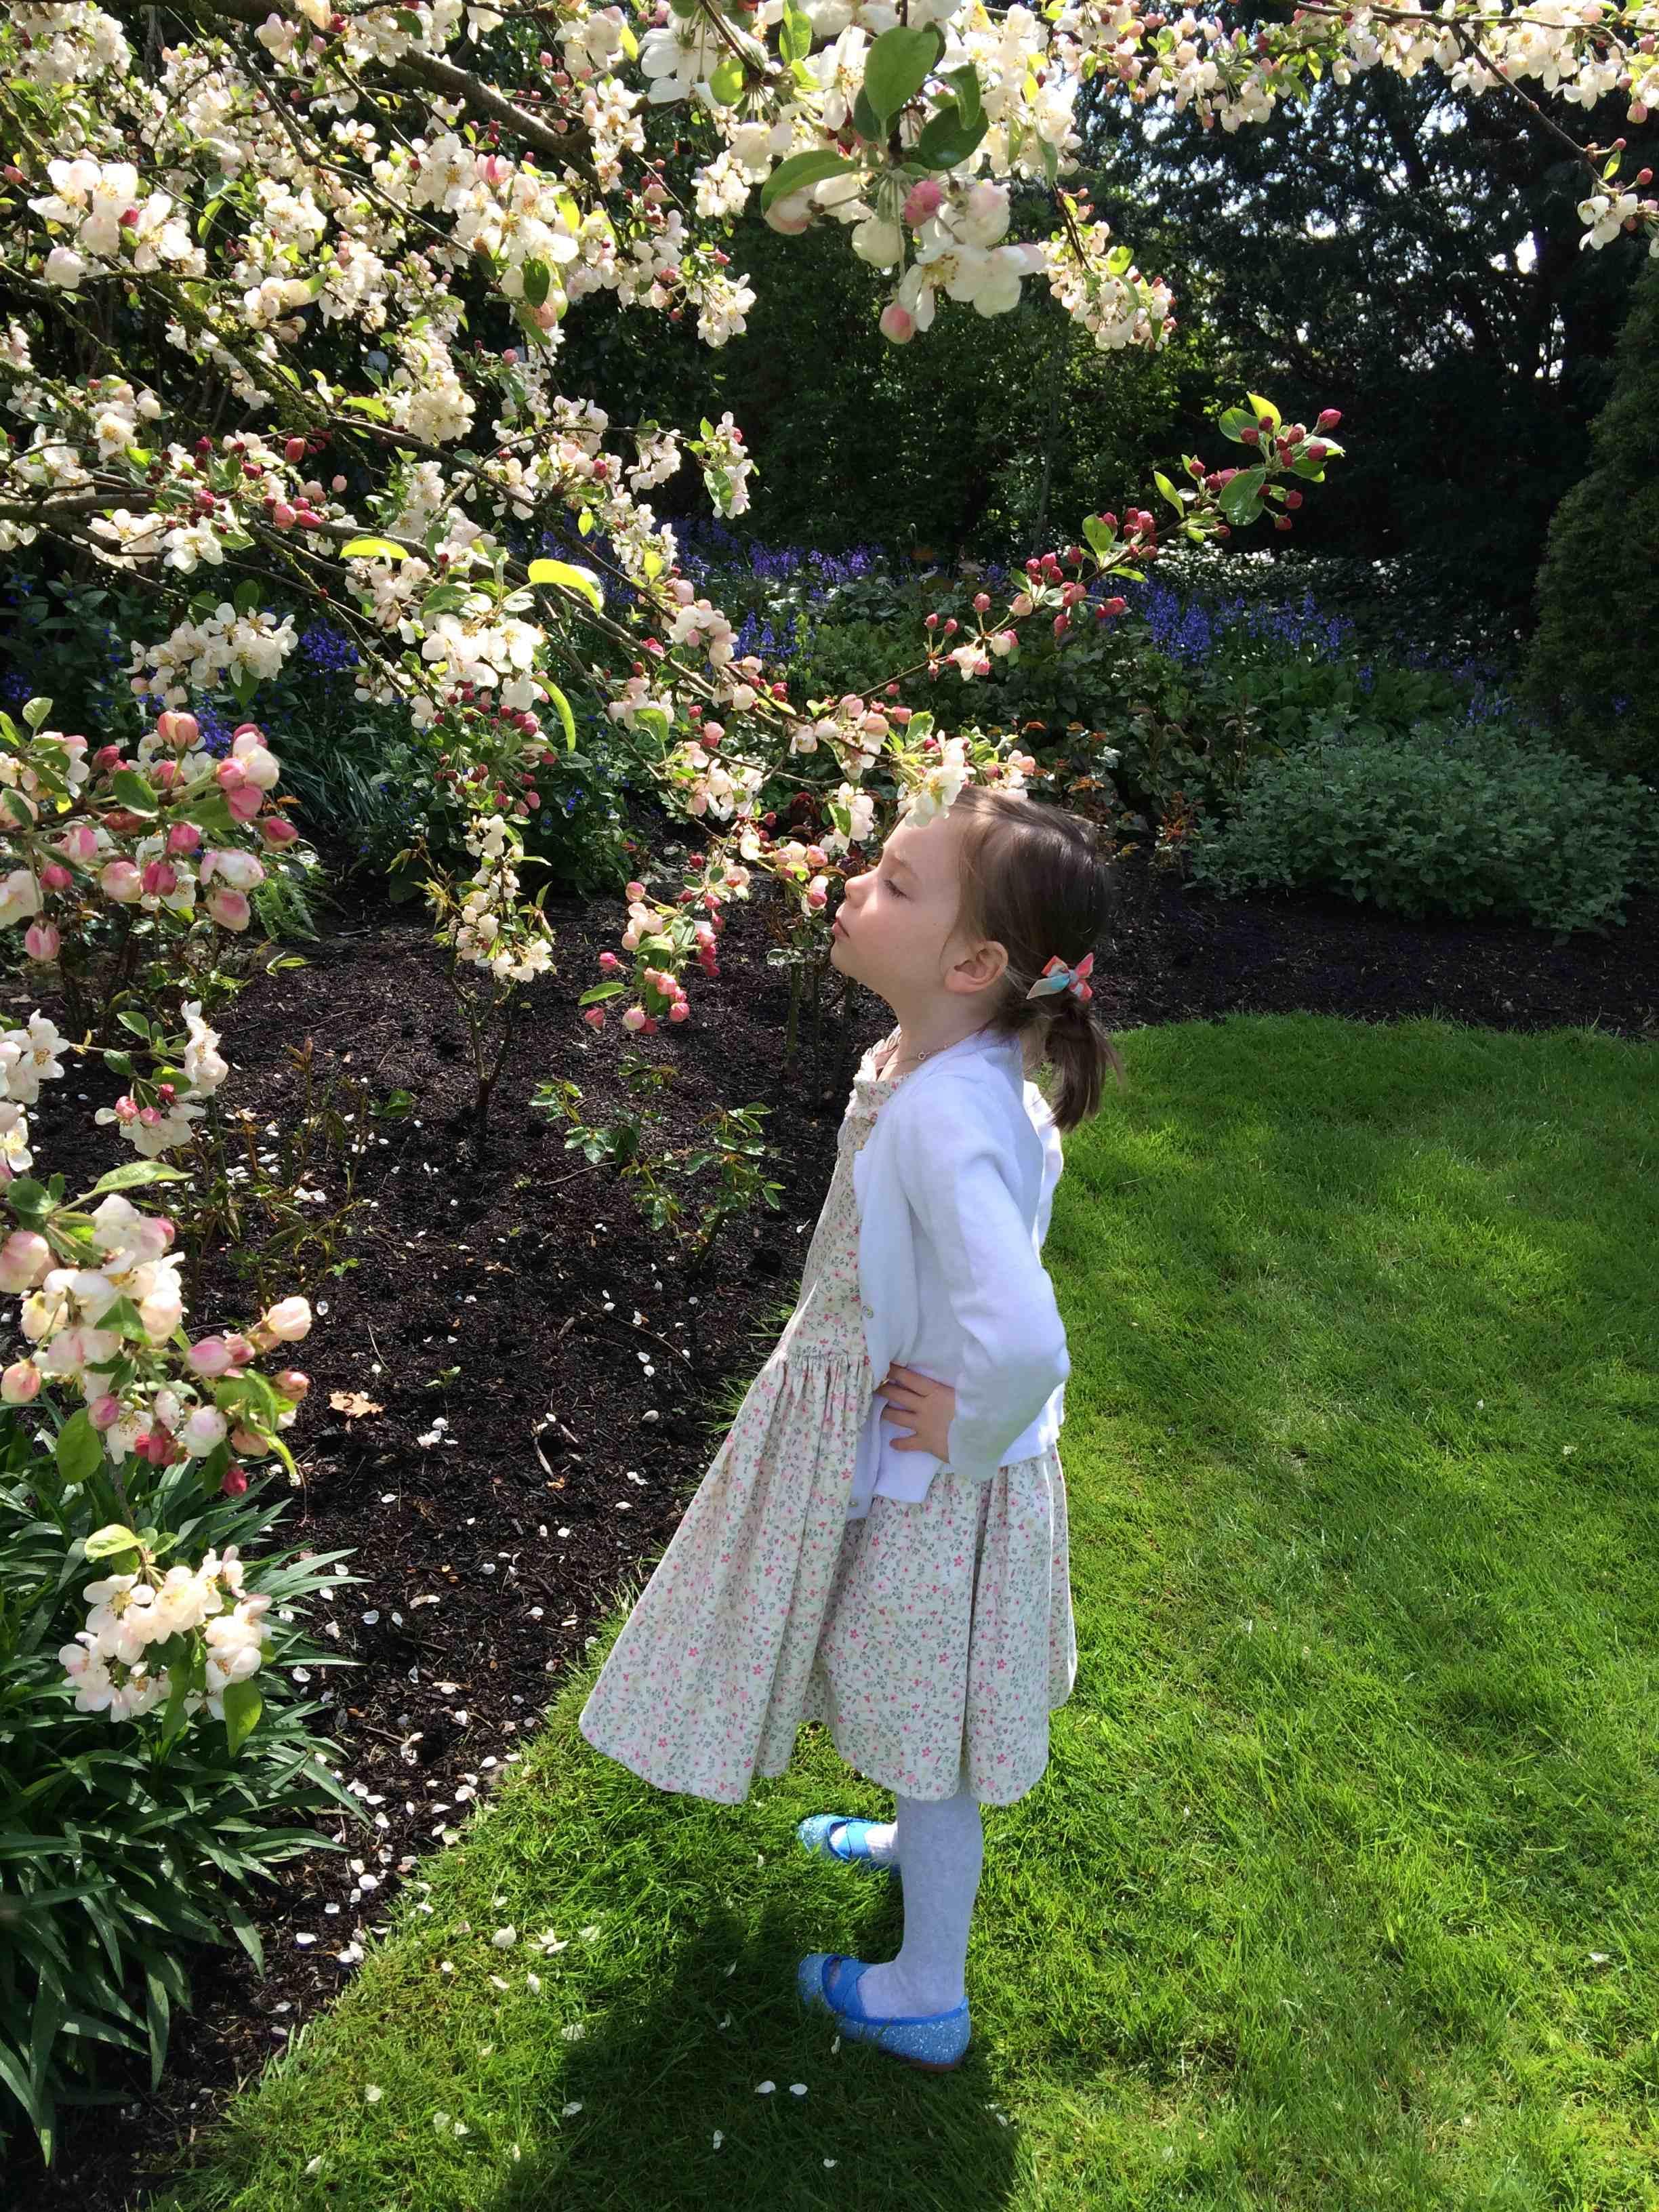 smelling-the-flowers-in-ireland.jpg